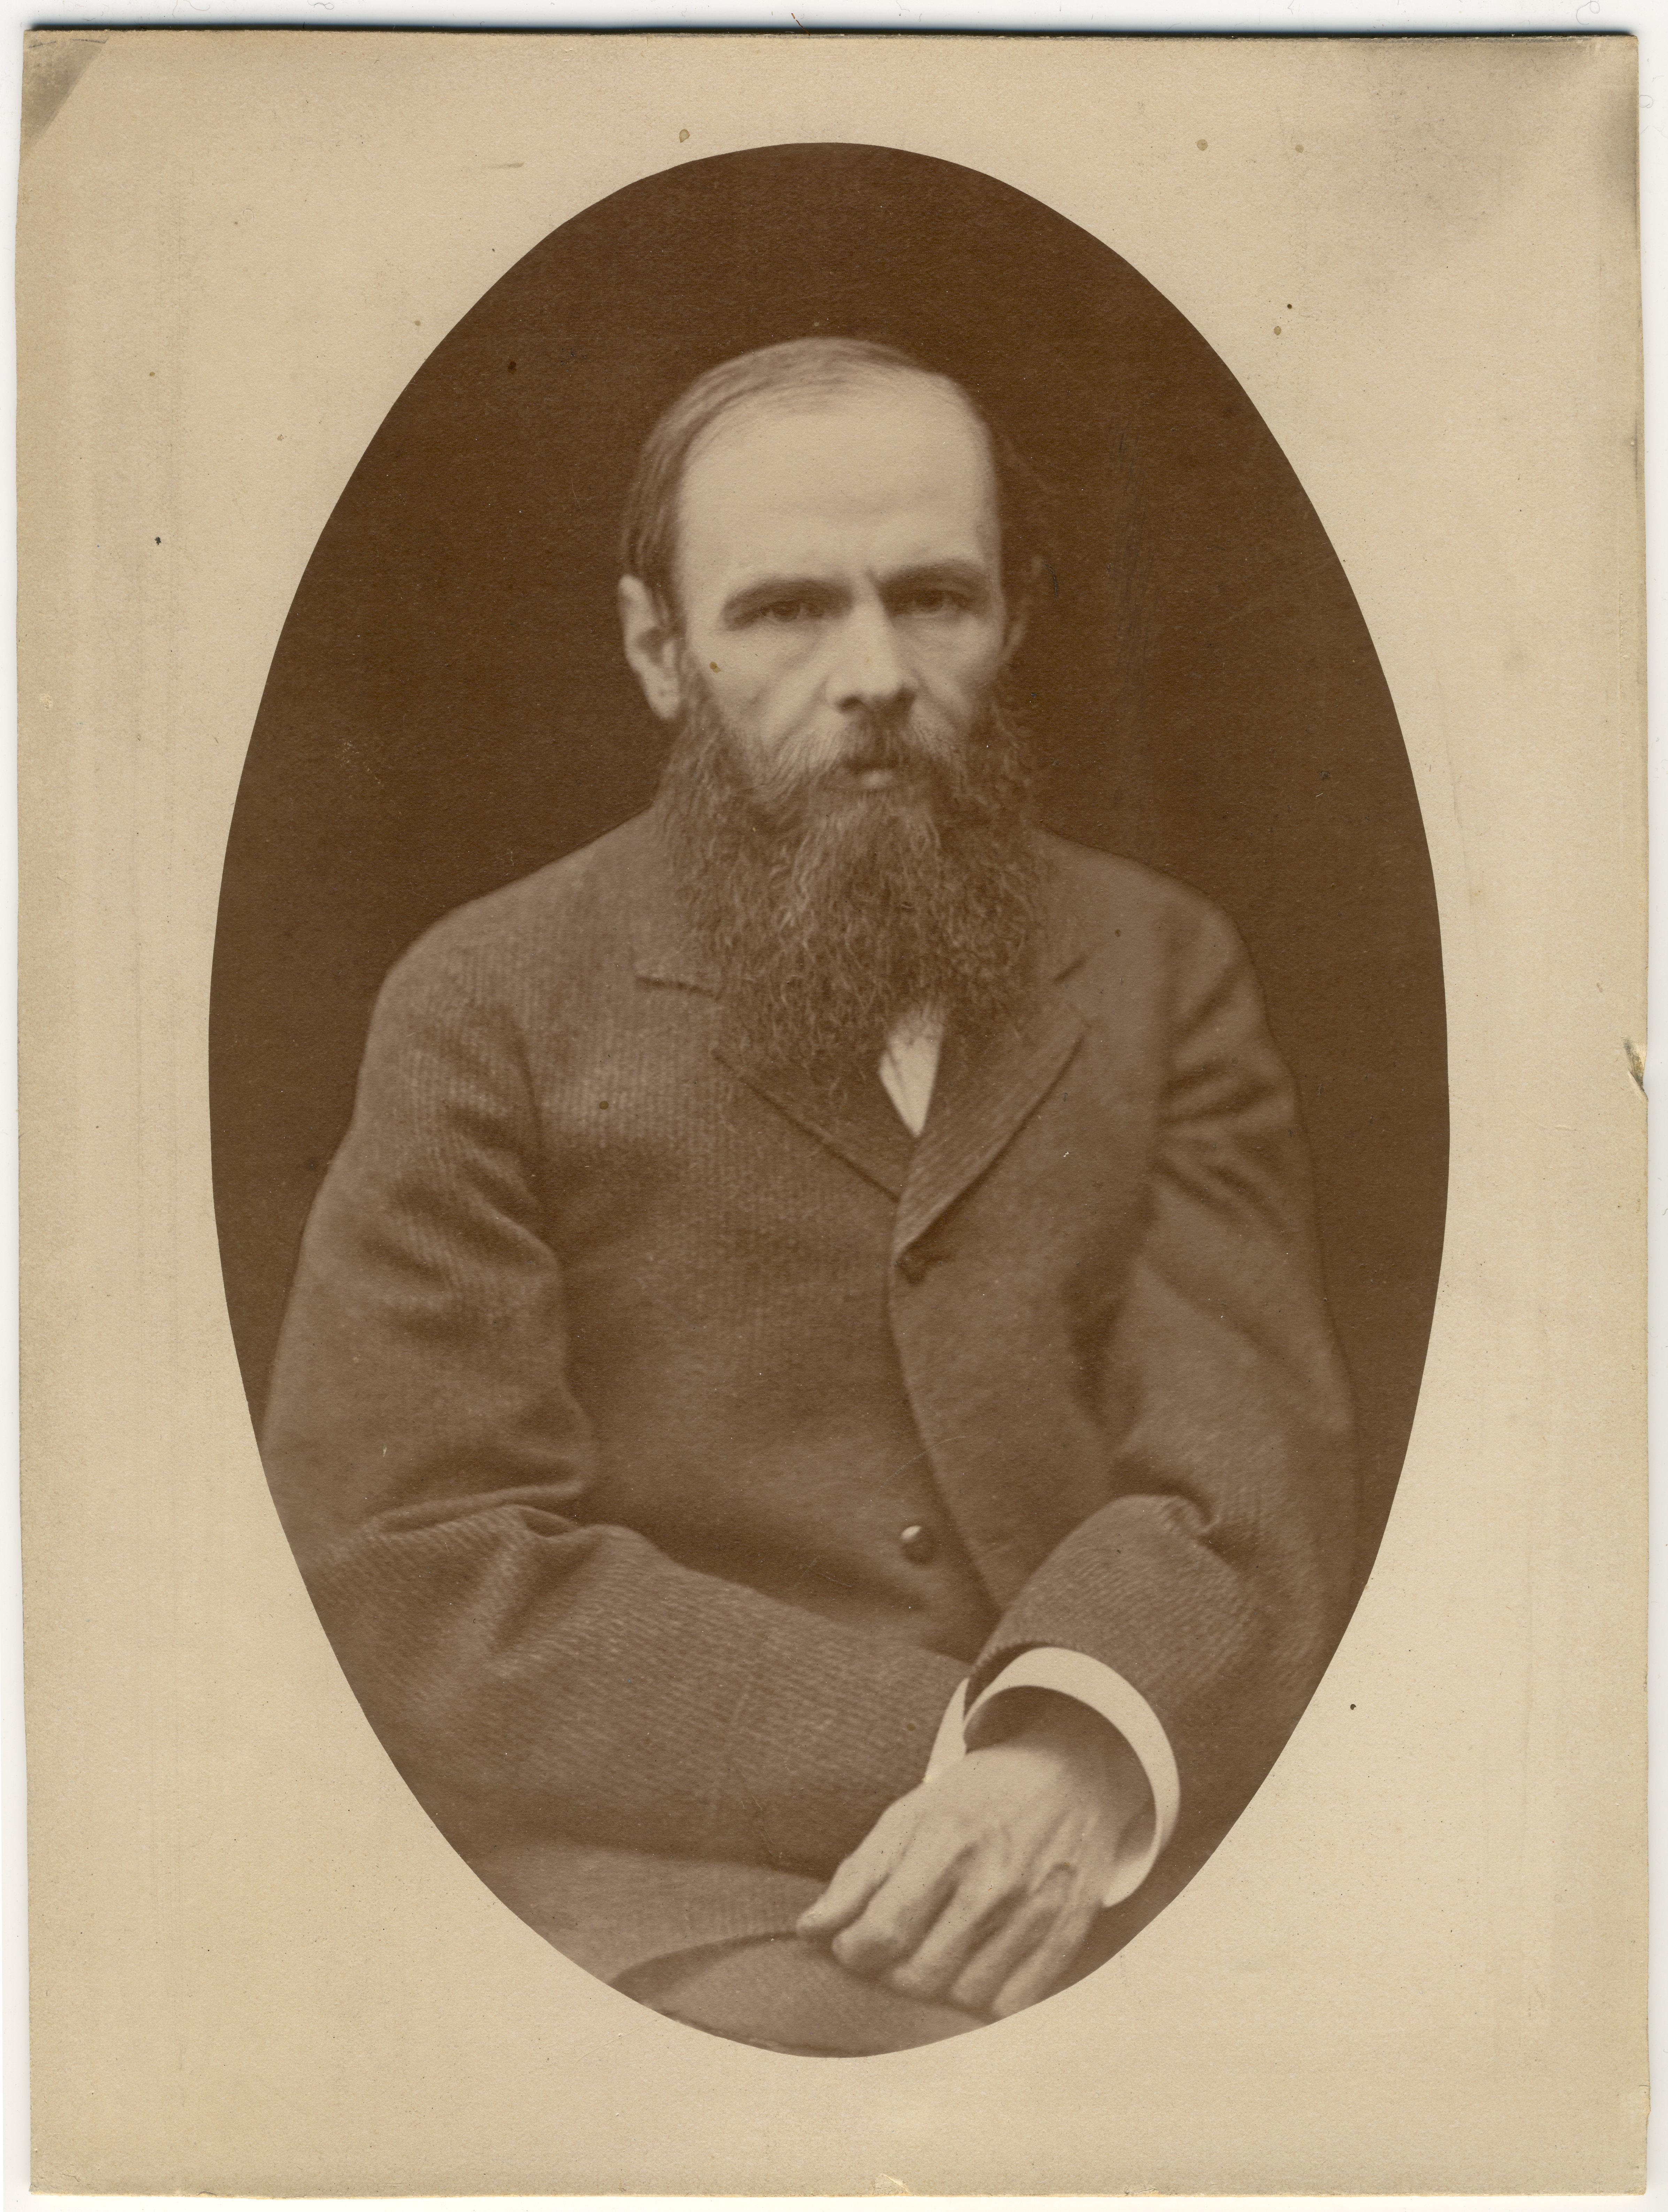 Revolutionary-Dostoevsky.jpeg